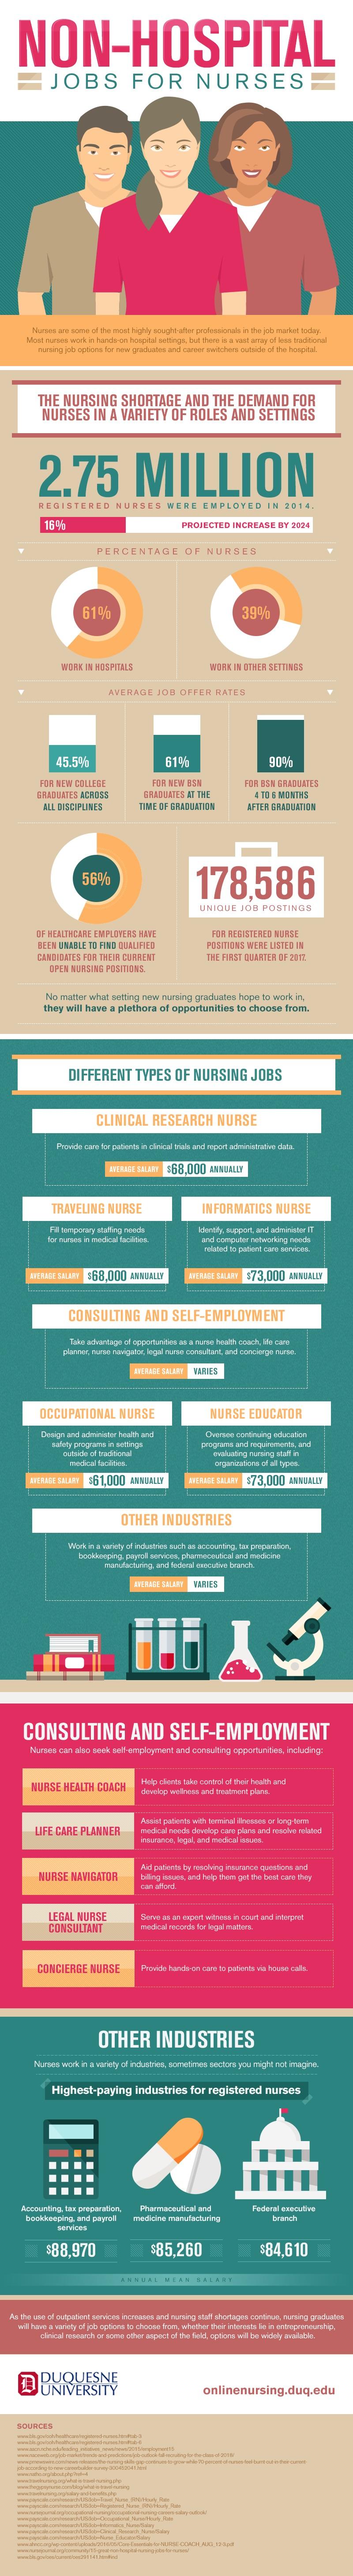 Infographic exploring non-hospital jobs for nurses